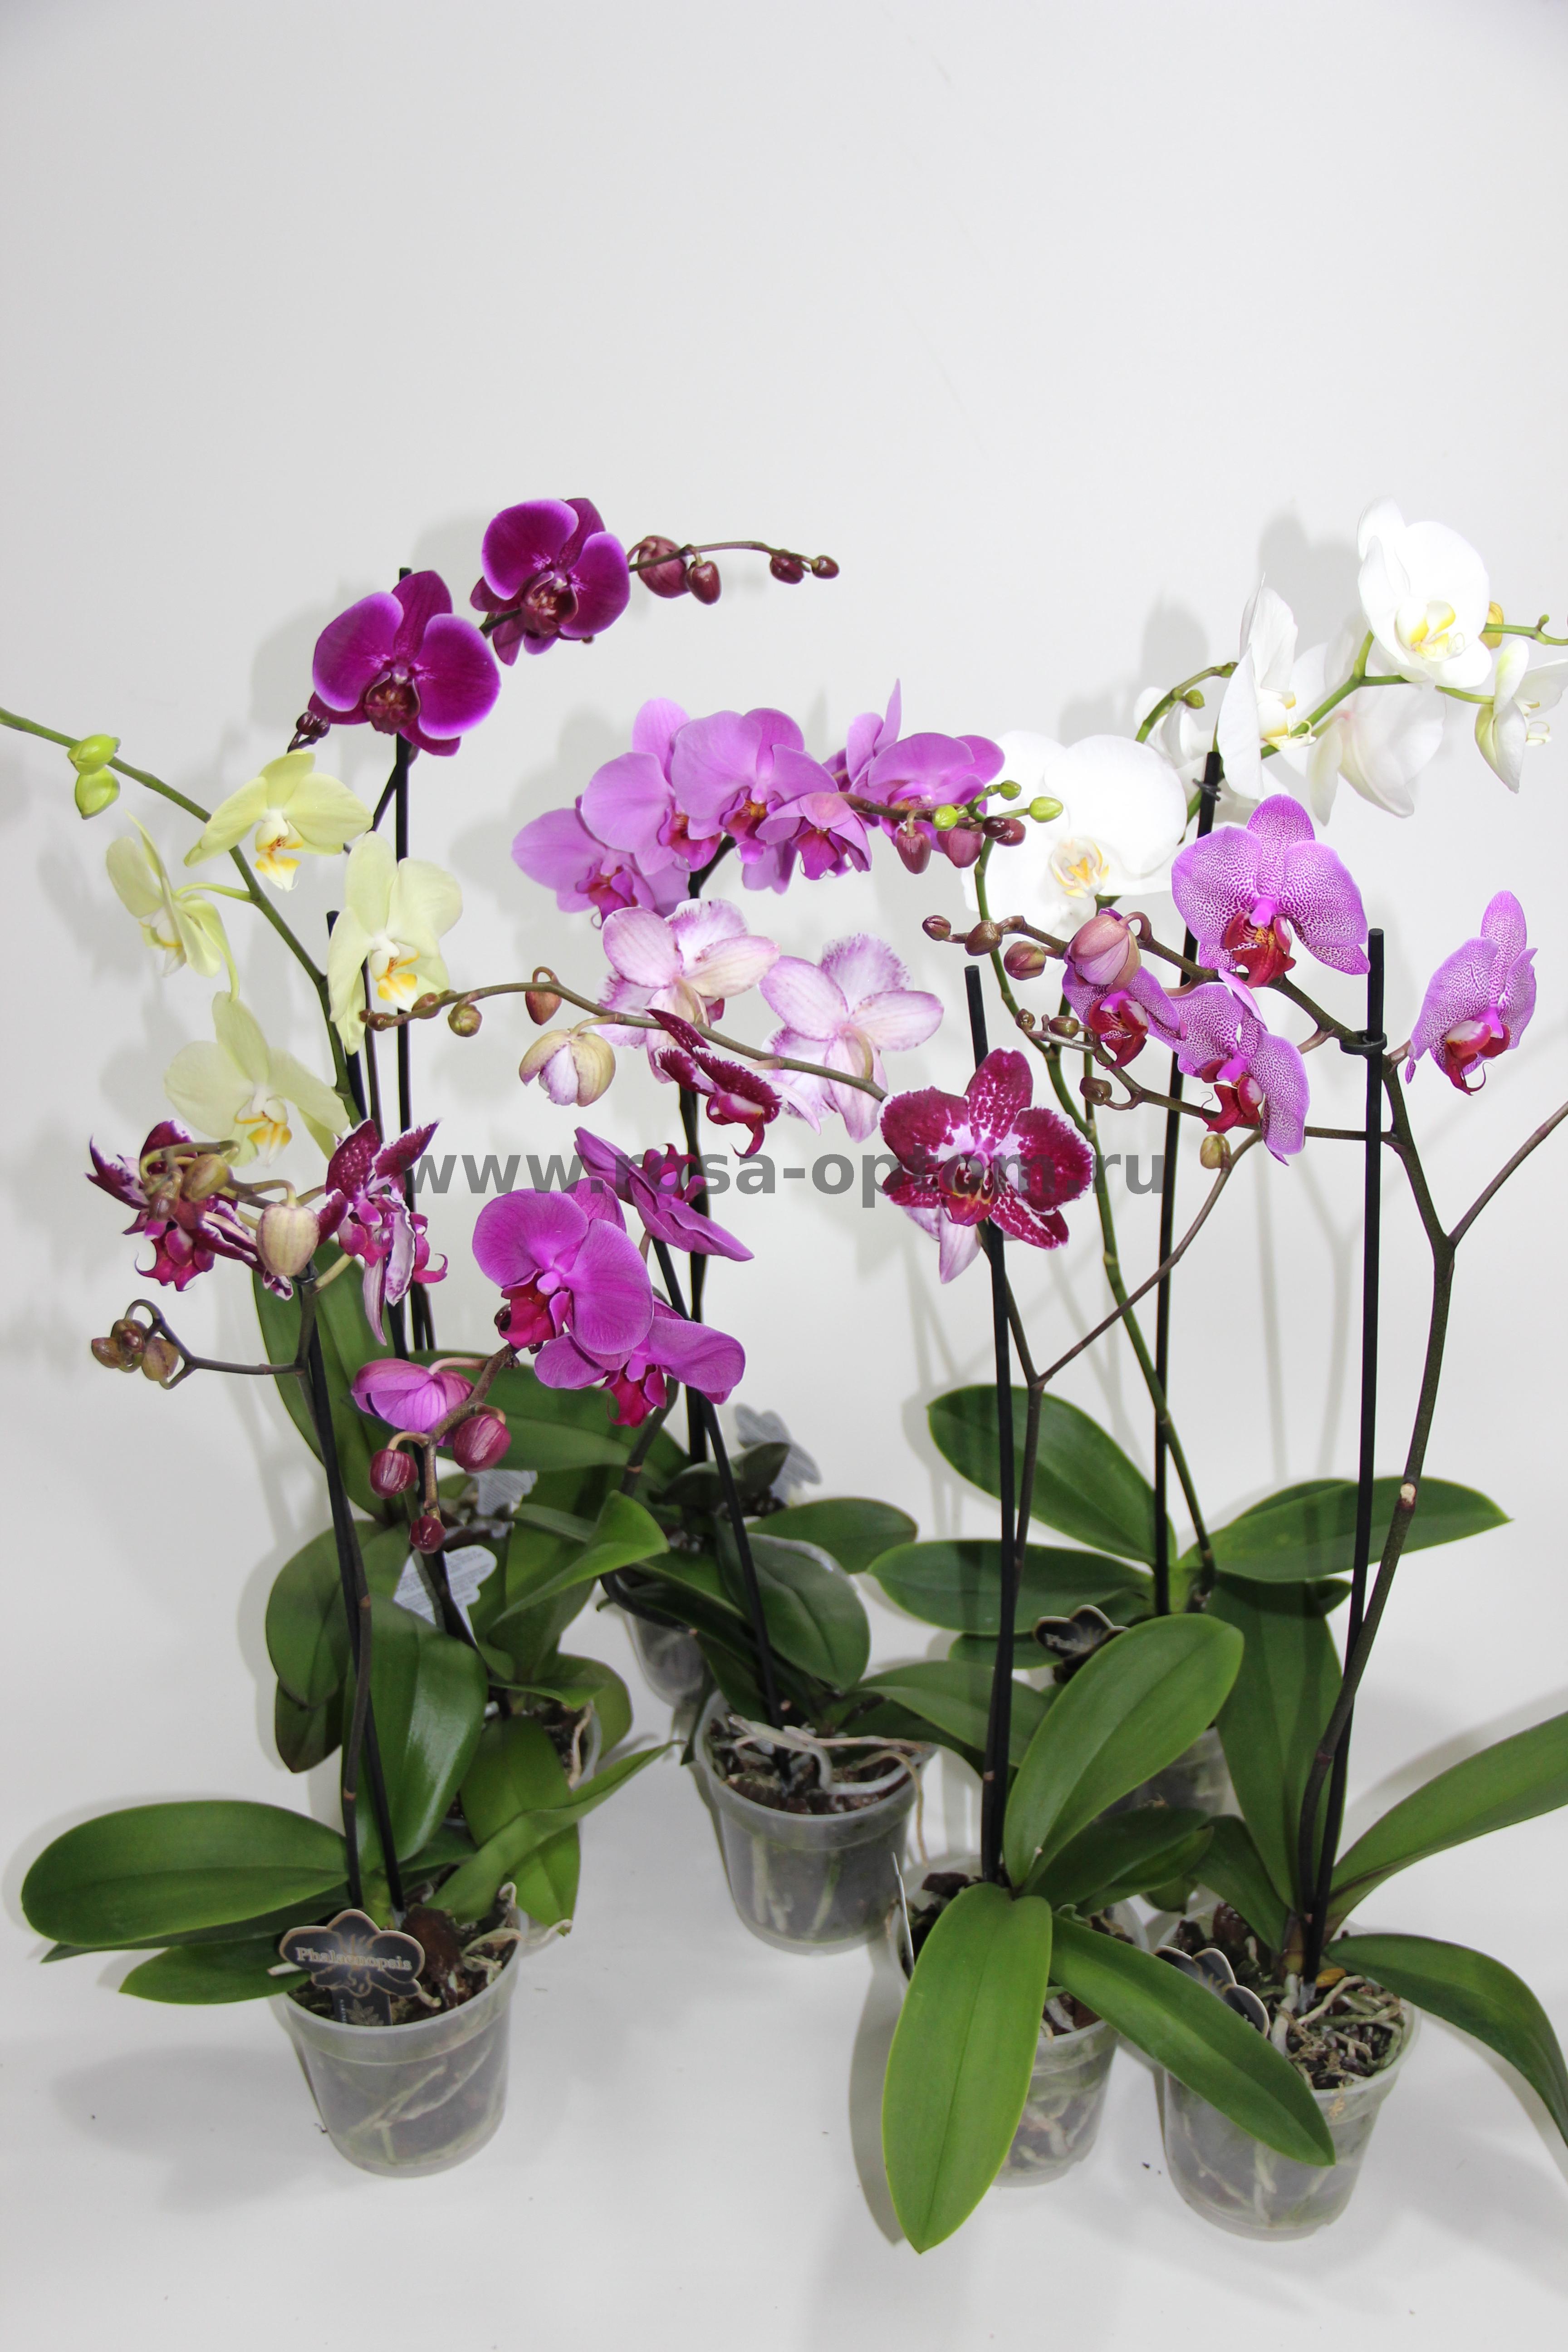 Уход за орхидеей фаленопсис в домашних условиях после